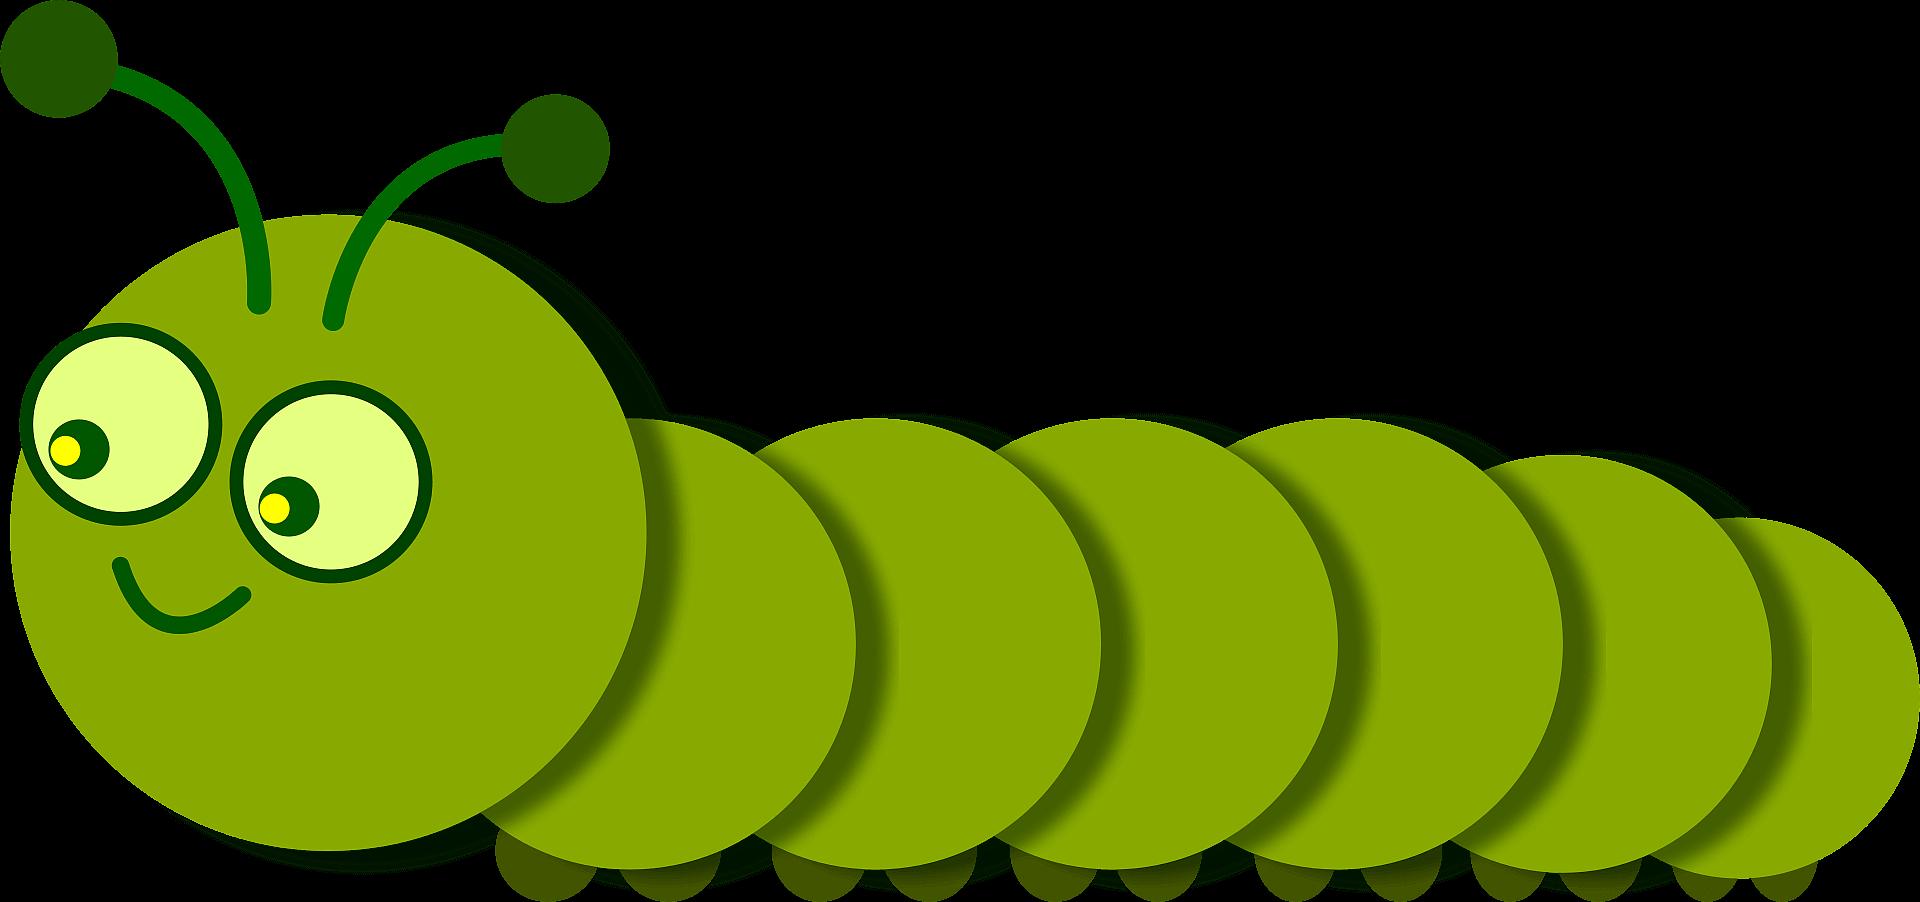 Caterpillar clipart transparent background 6